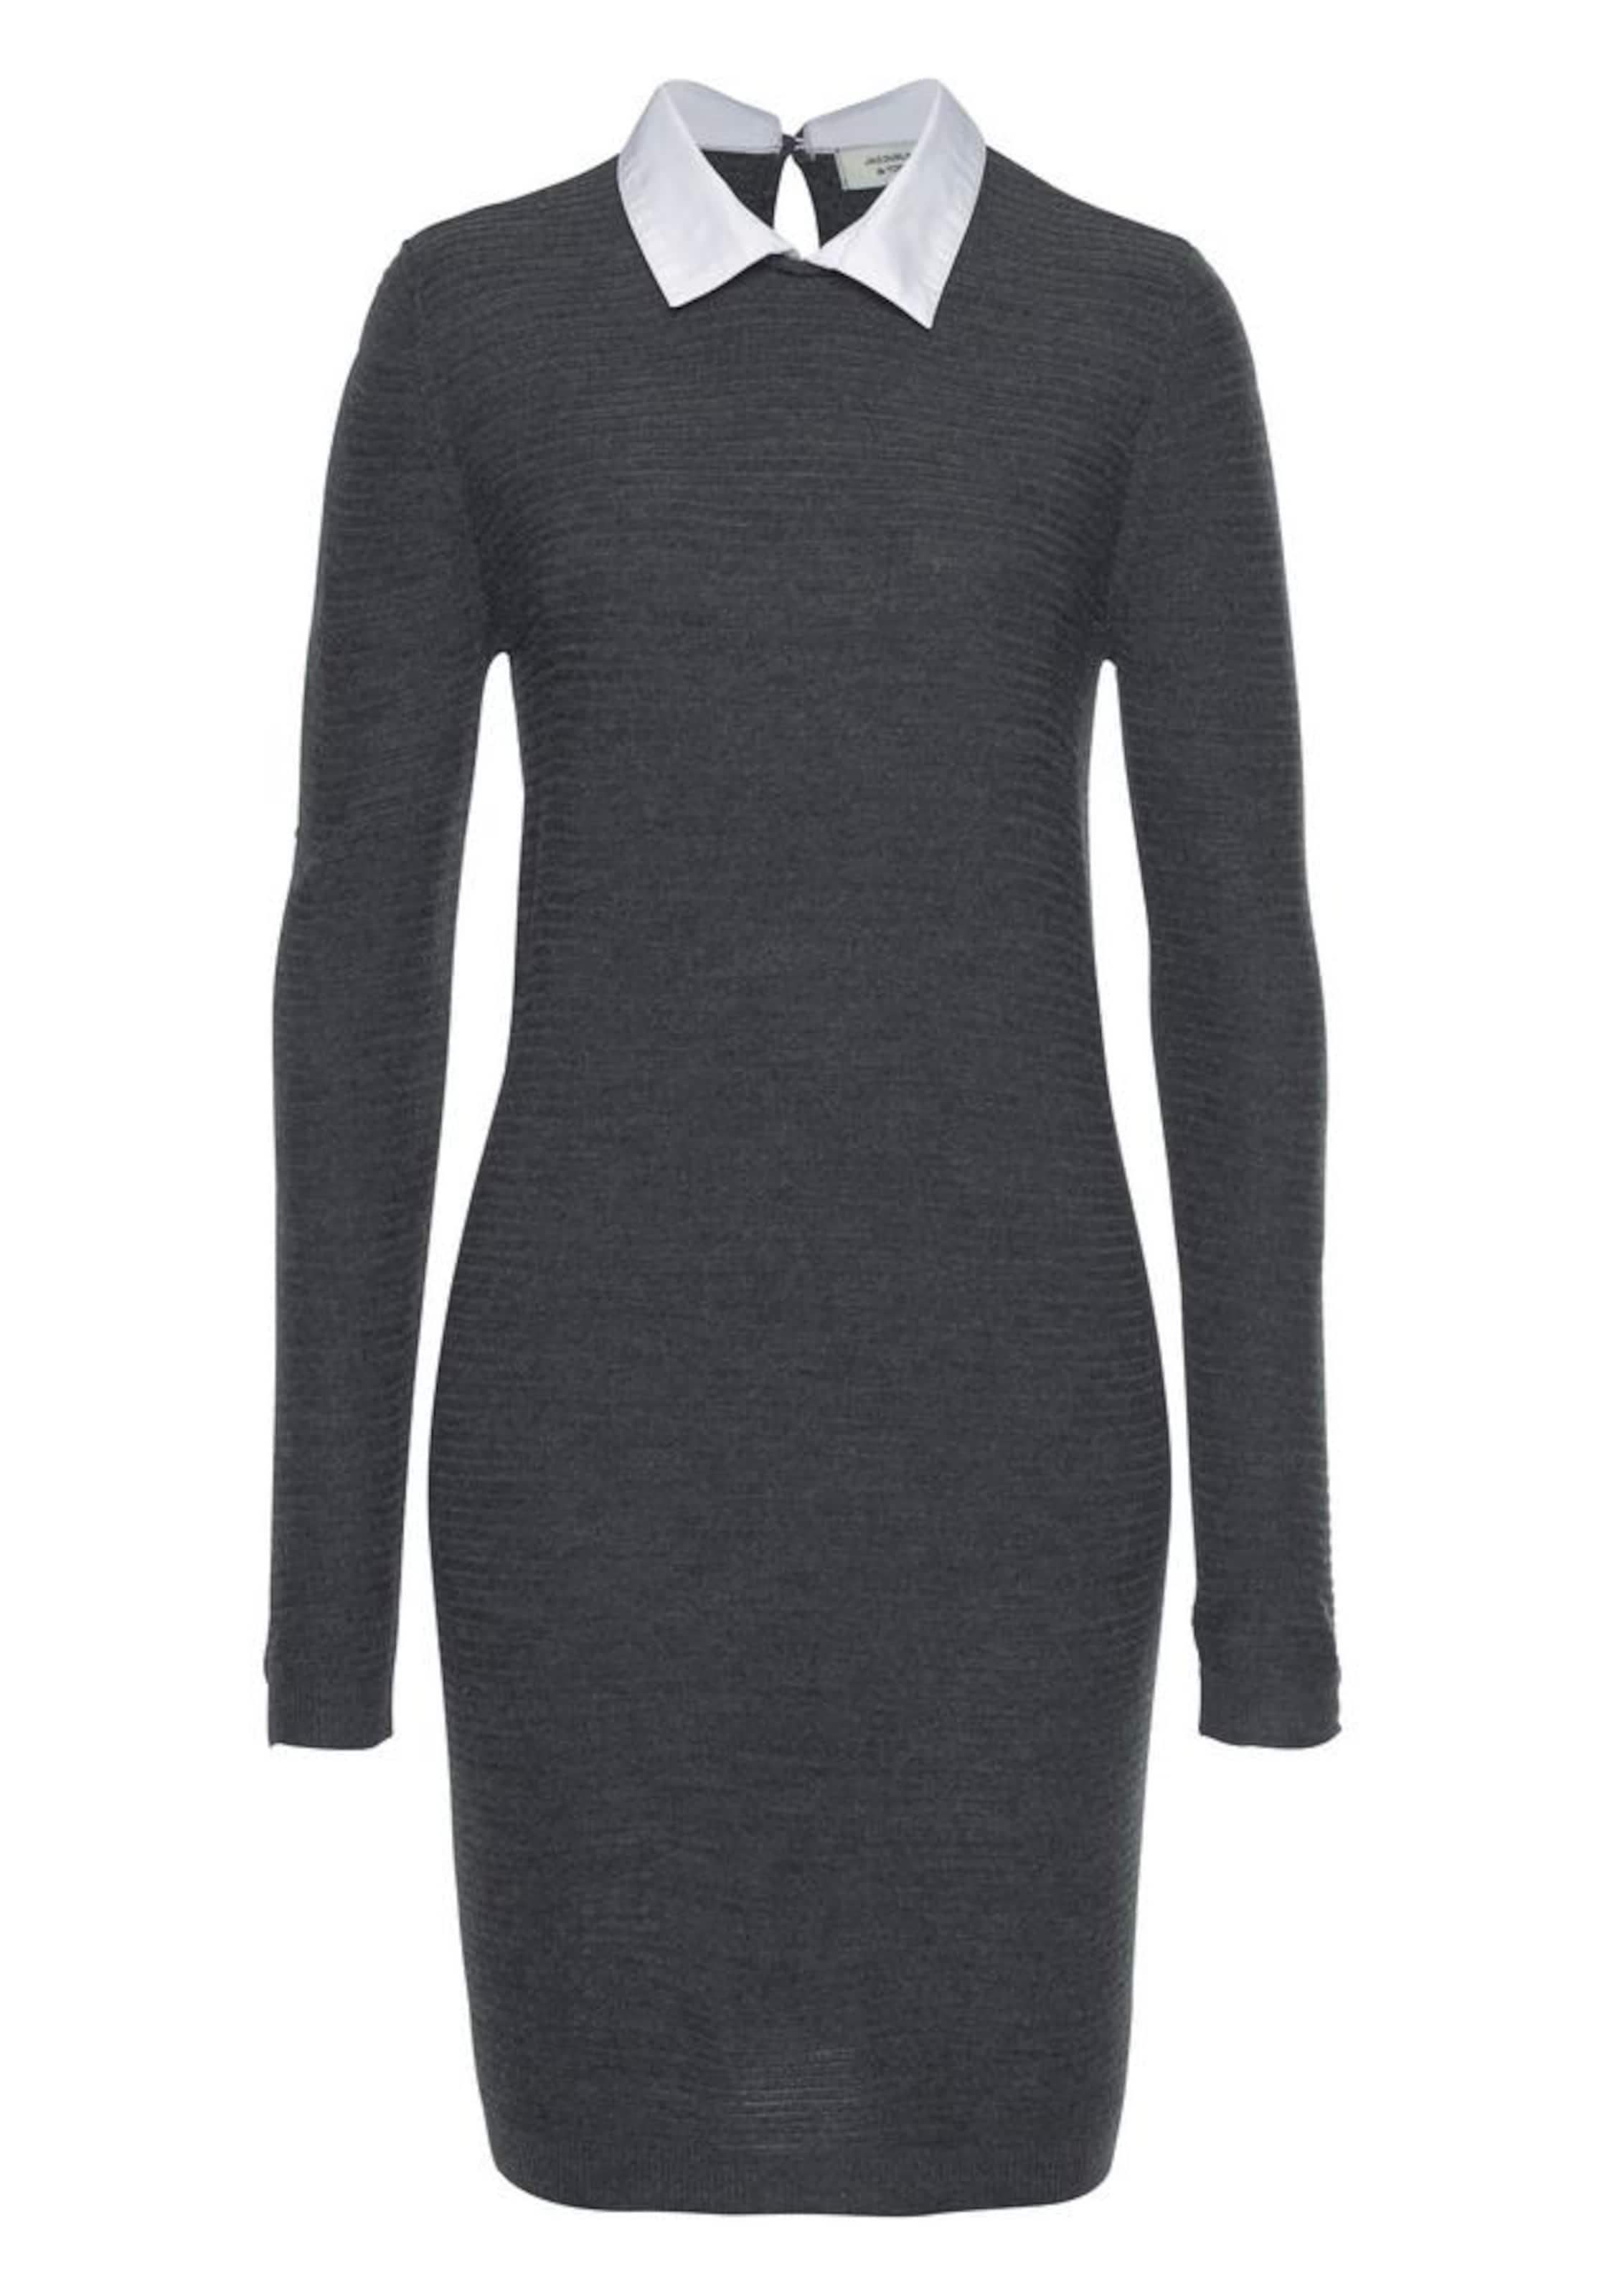 Kleid 'mathison' Yong Jacqueline In GraumeliertWeiß De 5jL4RA